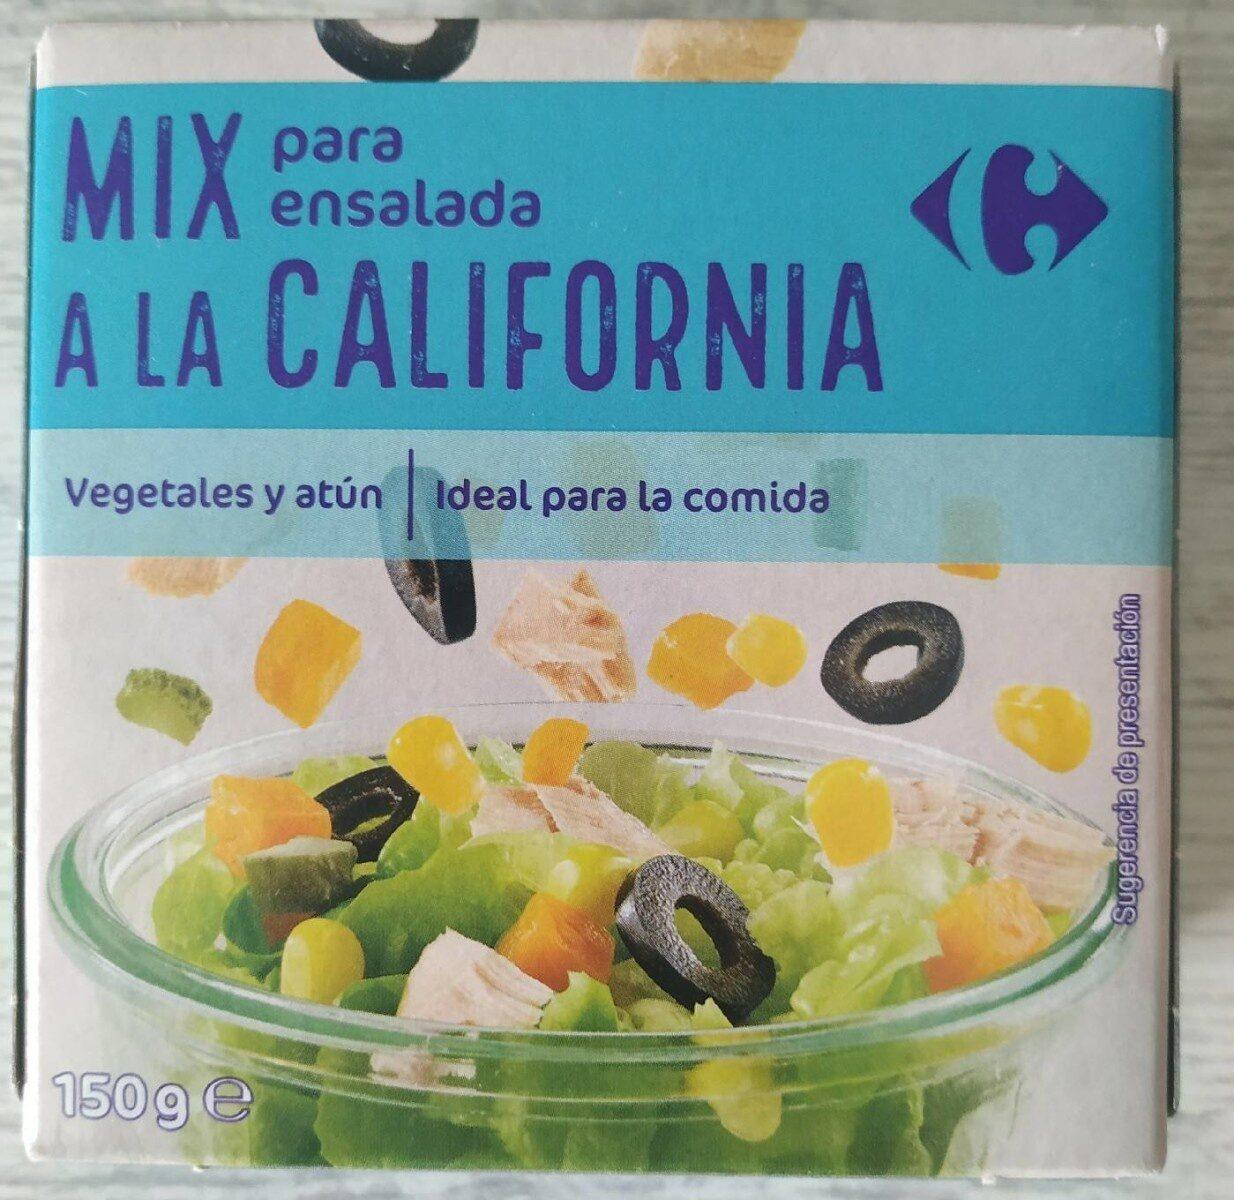 MIX para ensalada a la CALIFORNIANA - Prodotto - es